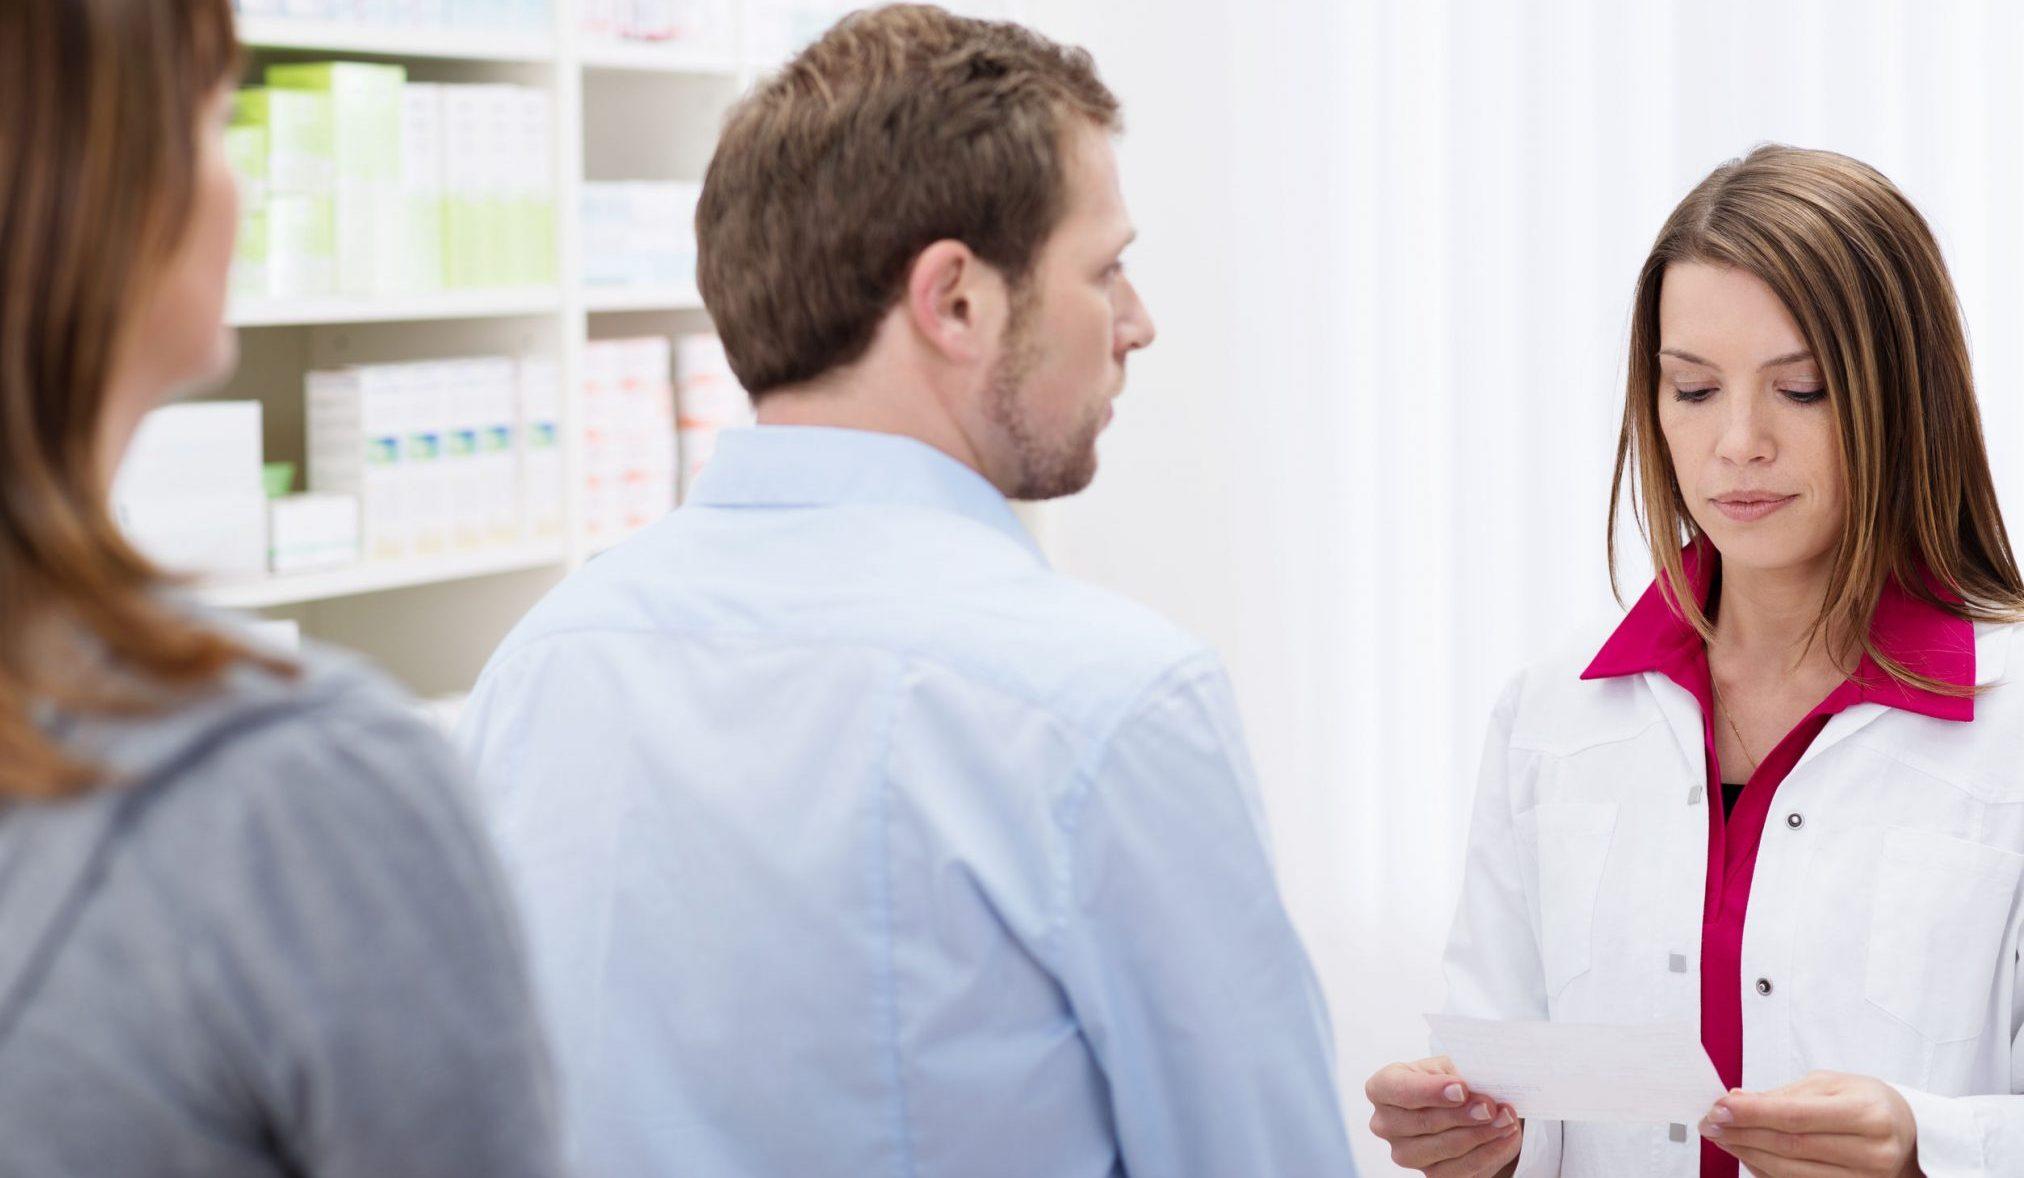 prescription pharmacist pharmacy customer patient